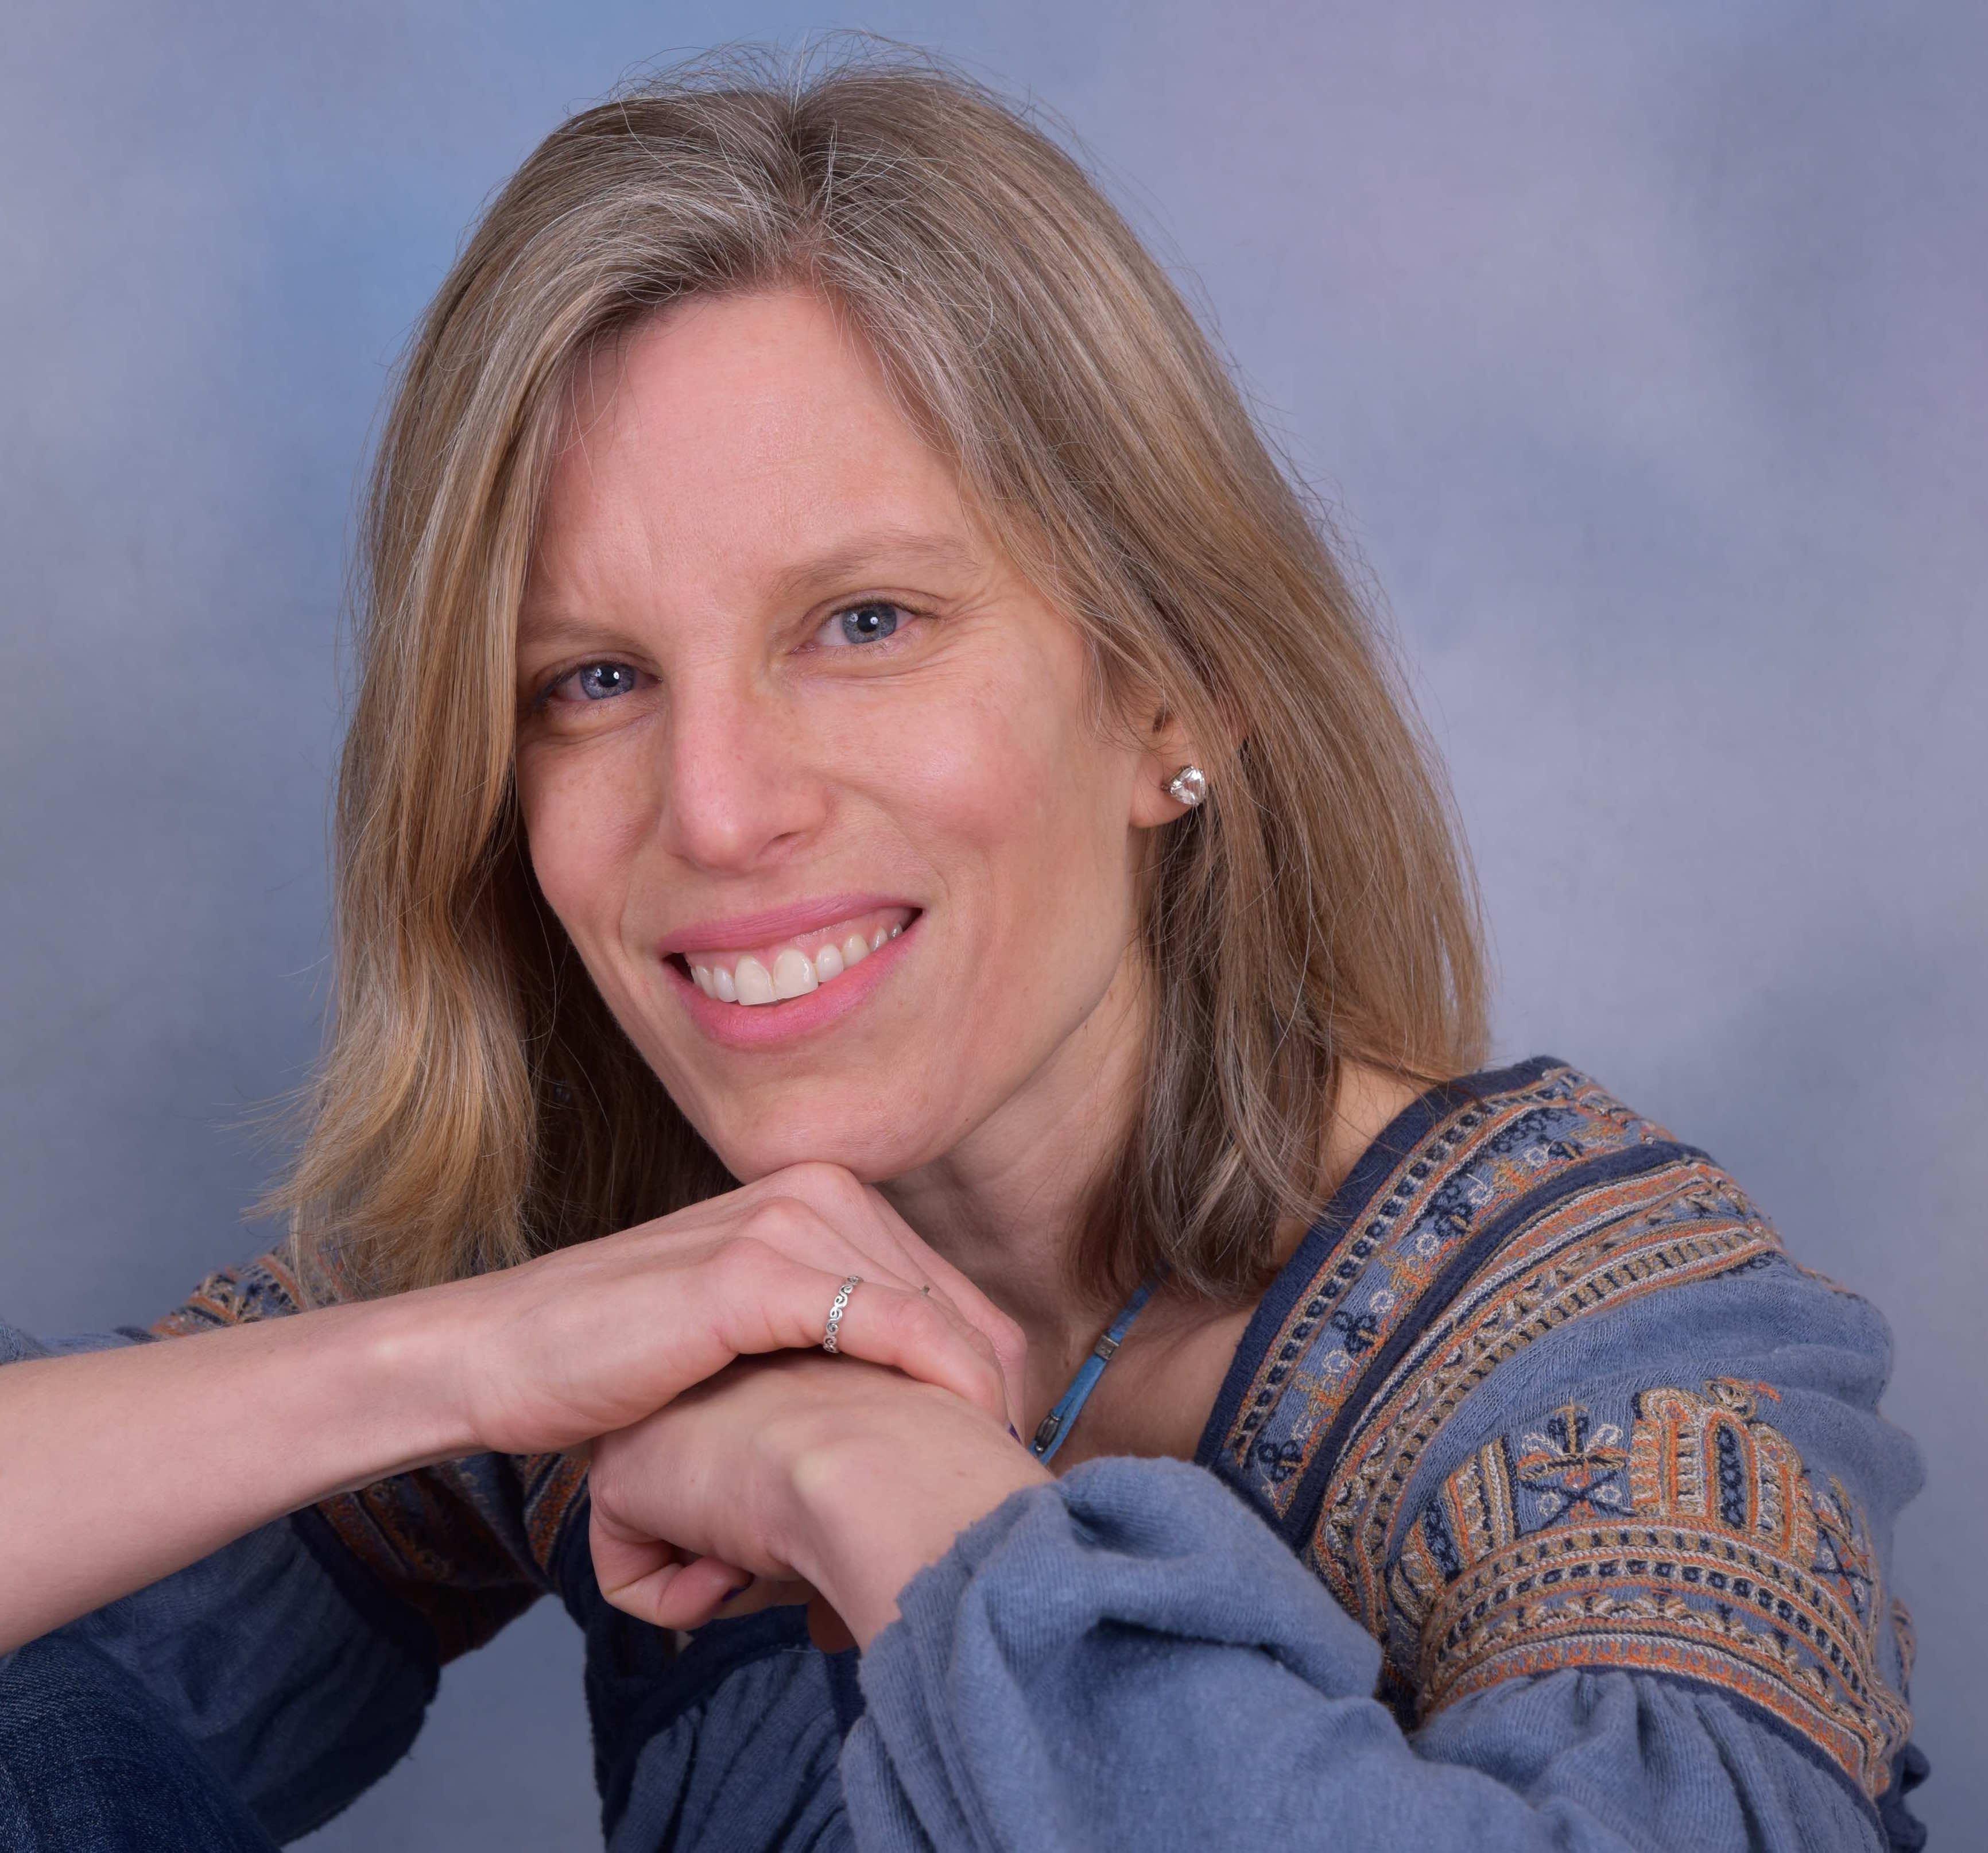 Intuitive Counselor, Author & Spiritual Teacher